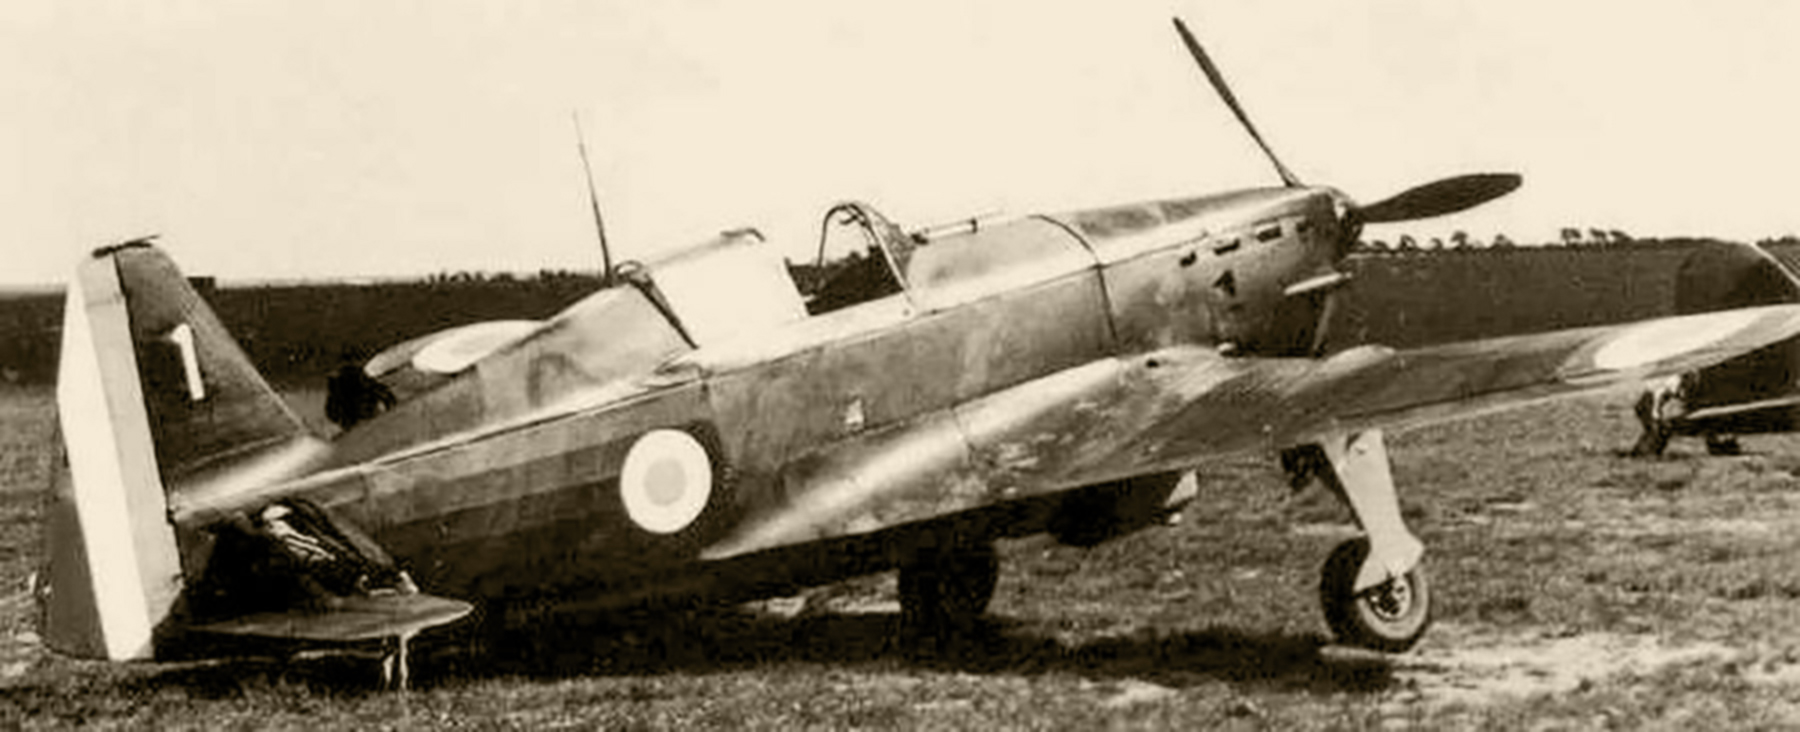 French Airforce Morane Saulnier MS 406C1 White 1 France 1940 web 01